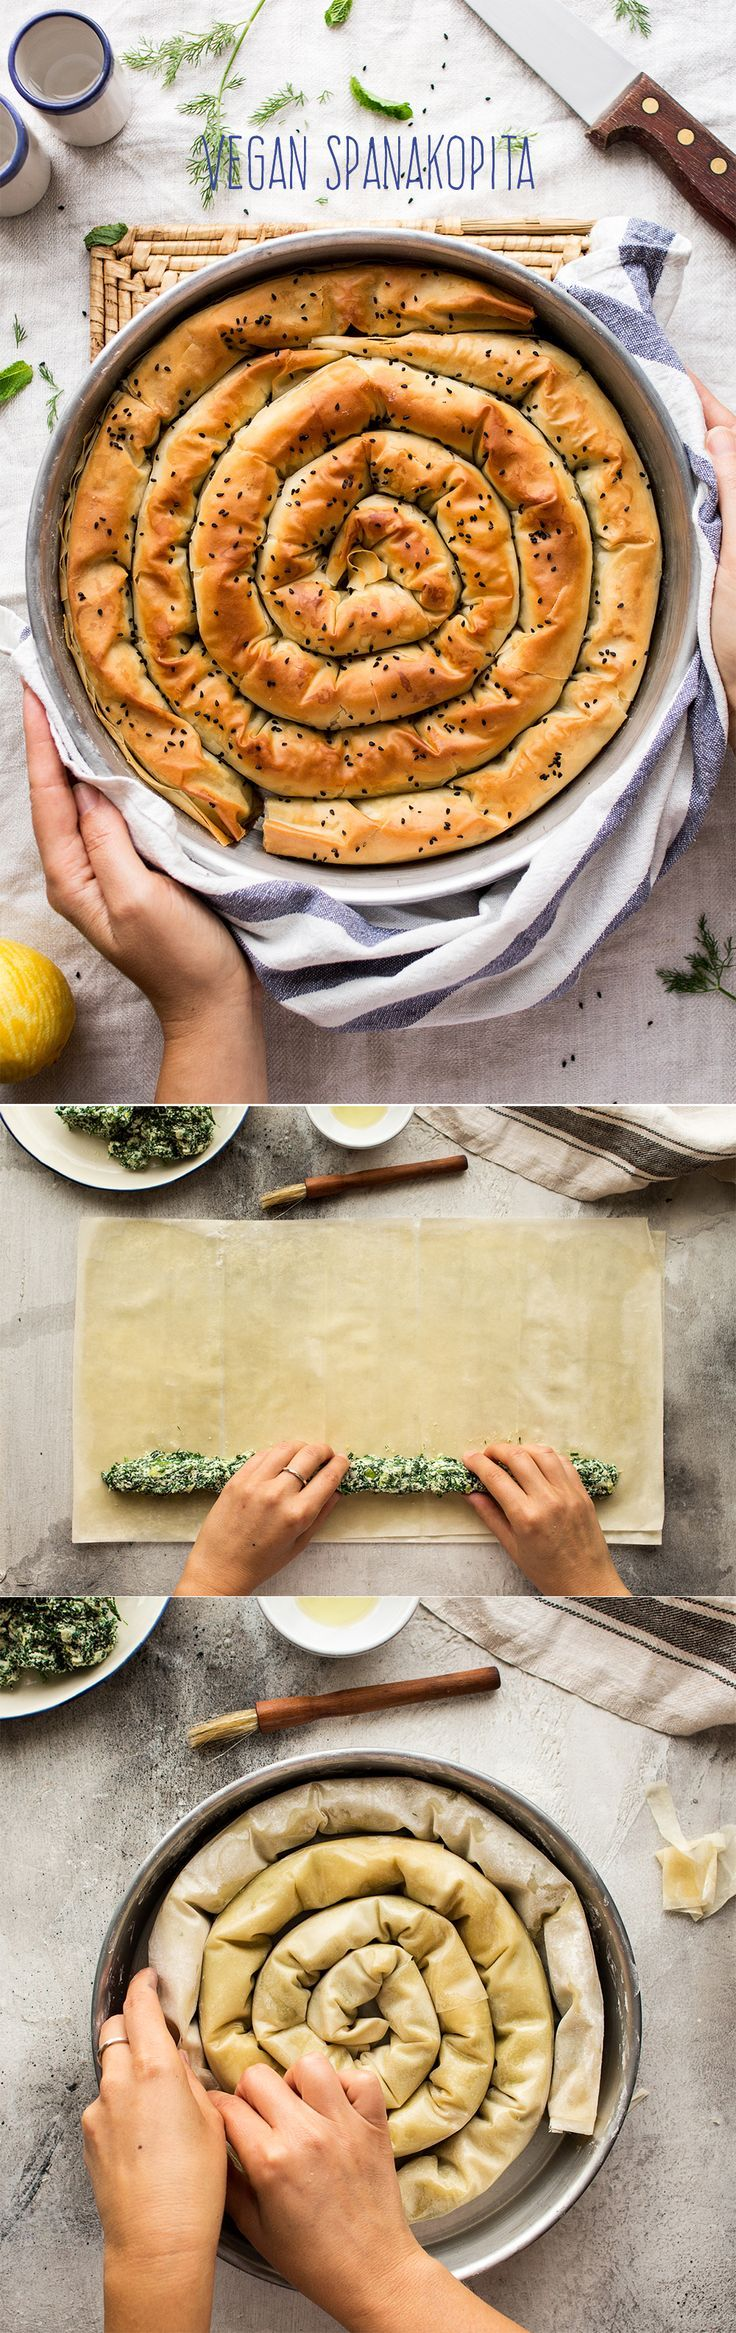 #vegan #greek #spanakopita #easy #dairyfree #spinach